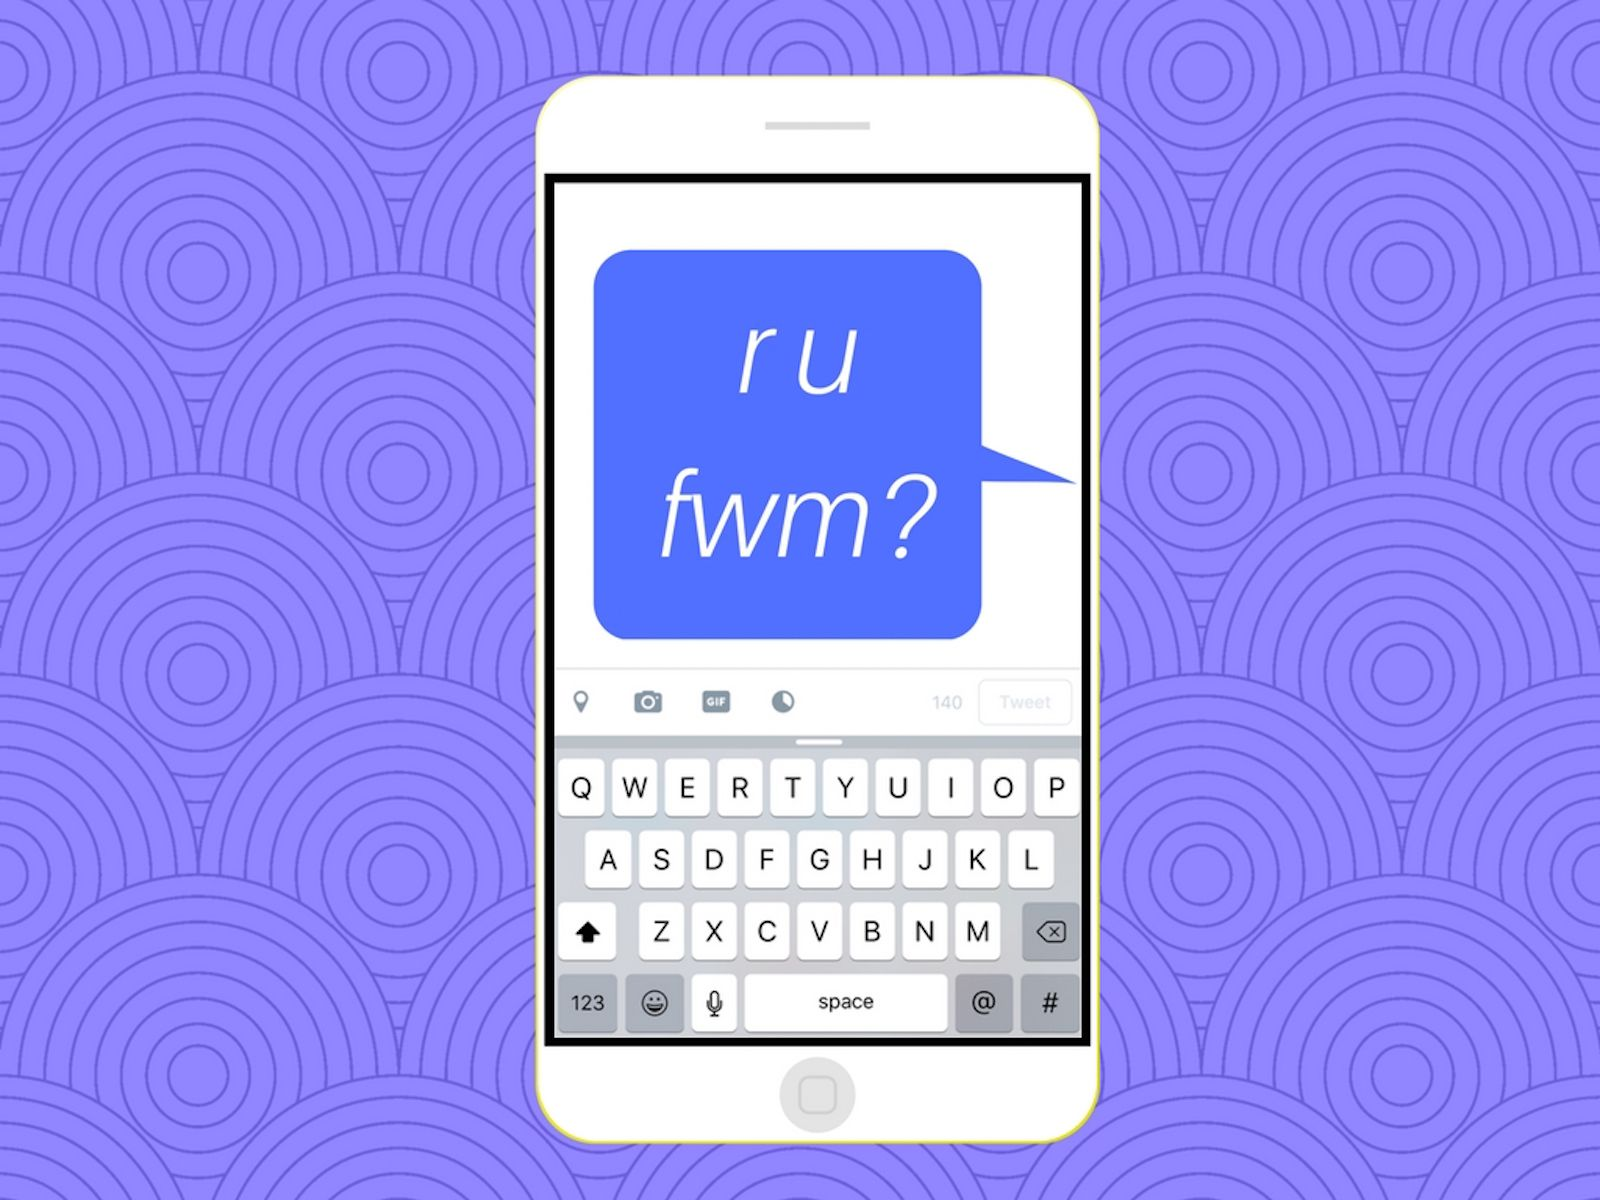 What Does FWM Mean?